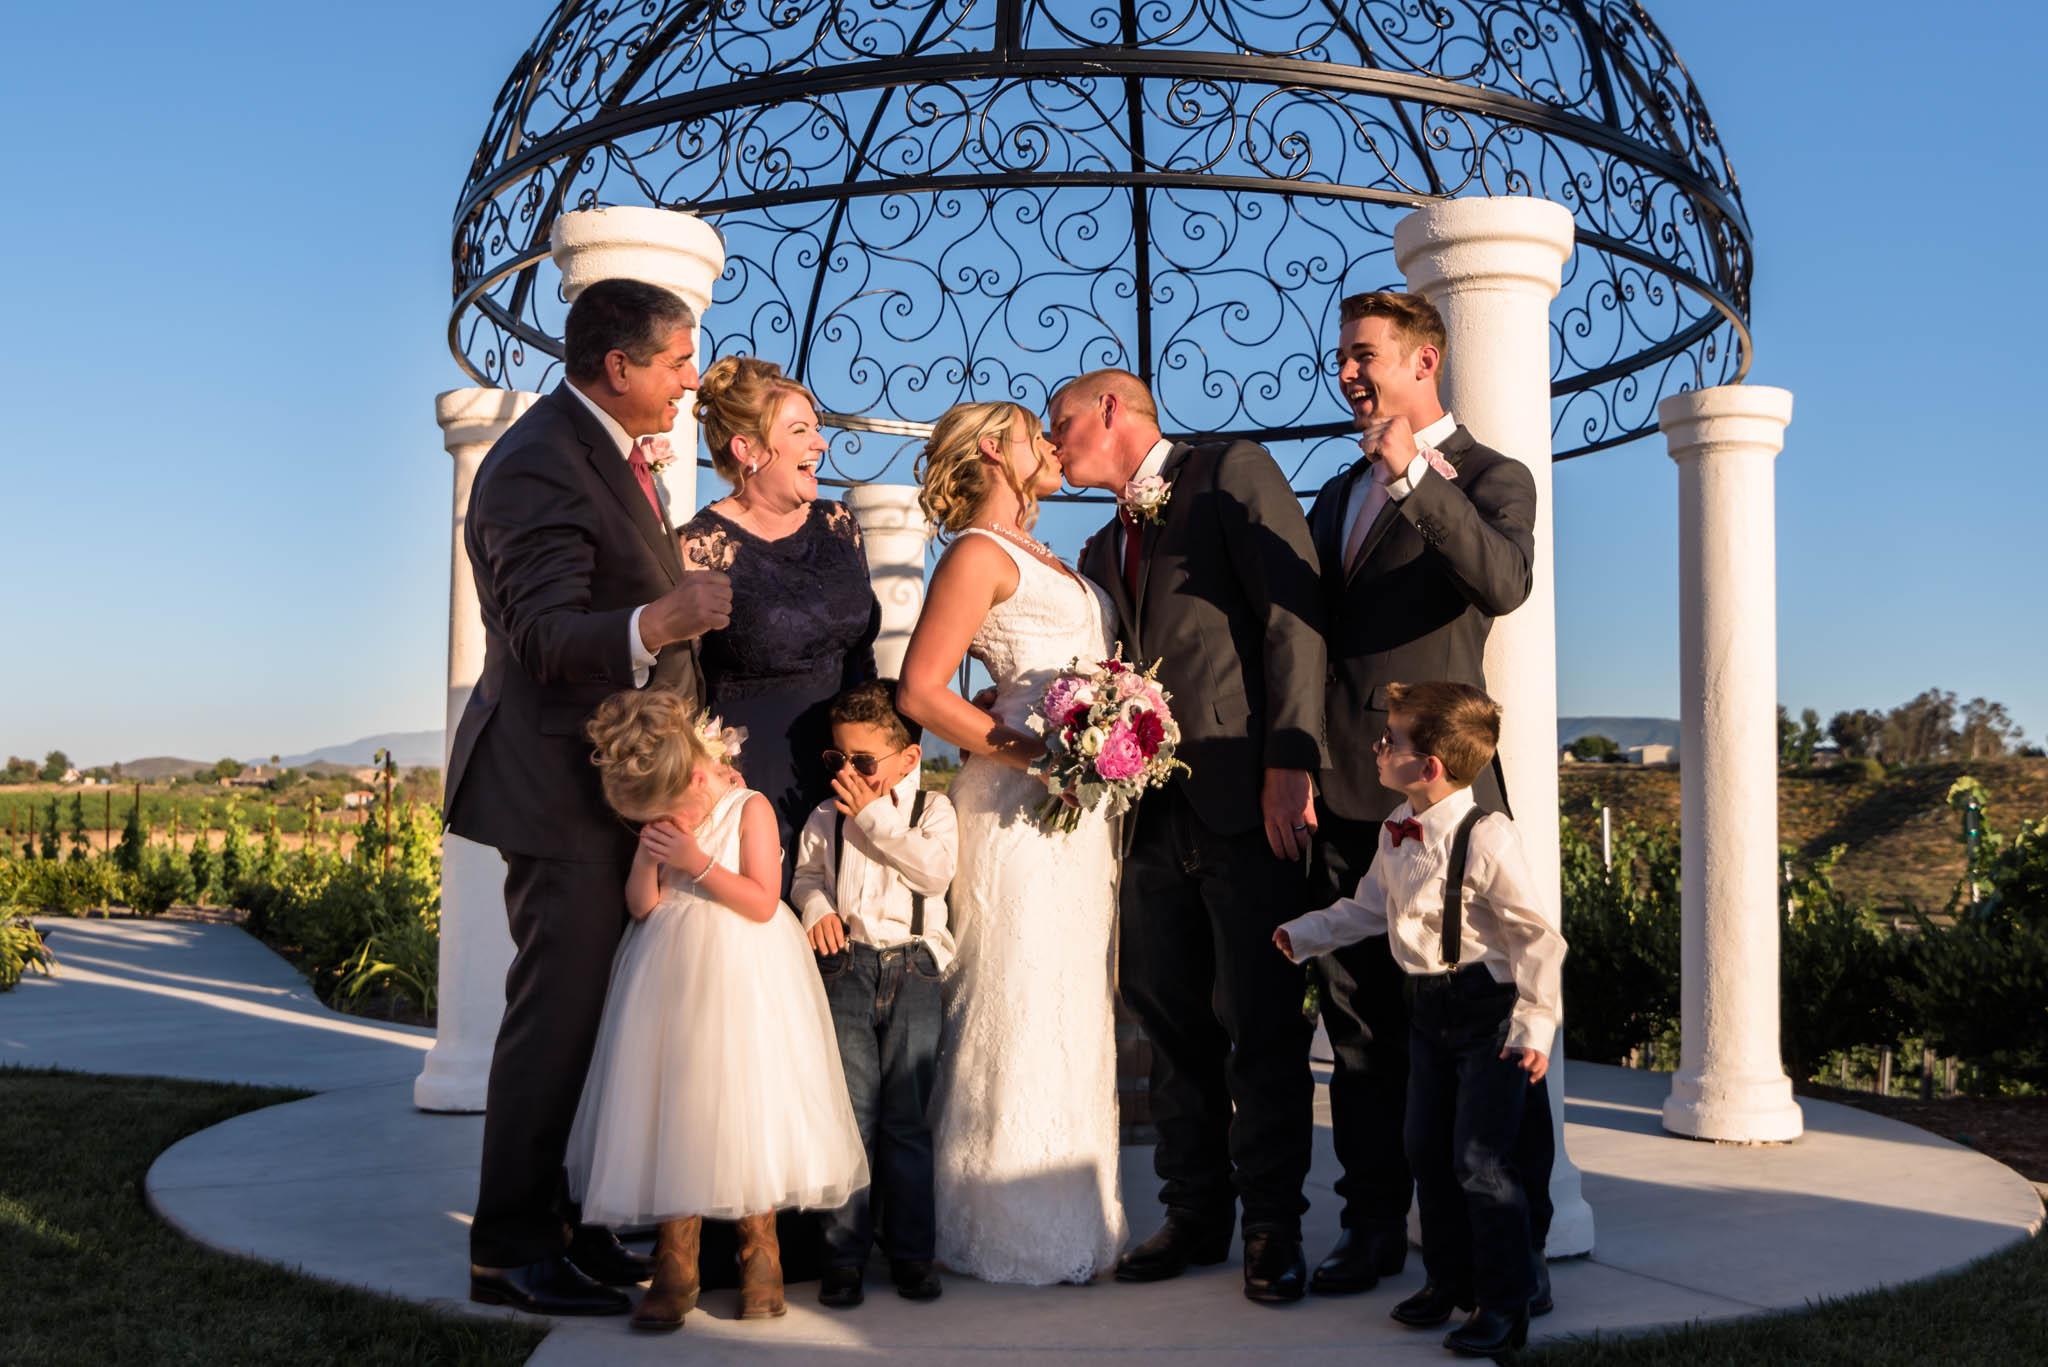 Avensole-Winery-Temecula-Wedding-Josh-and-Olivia-3683.JPG